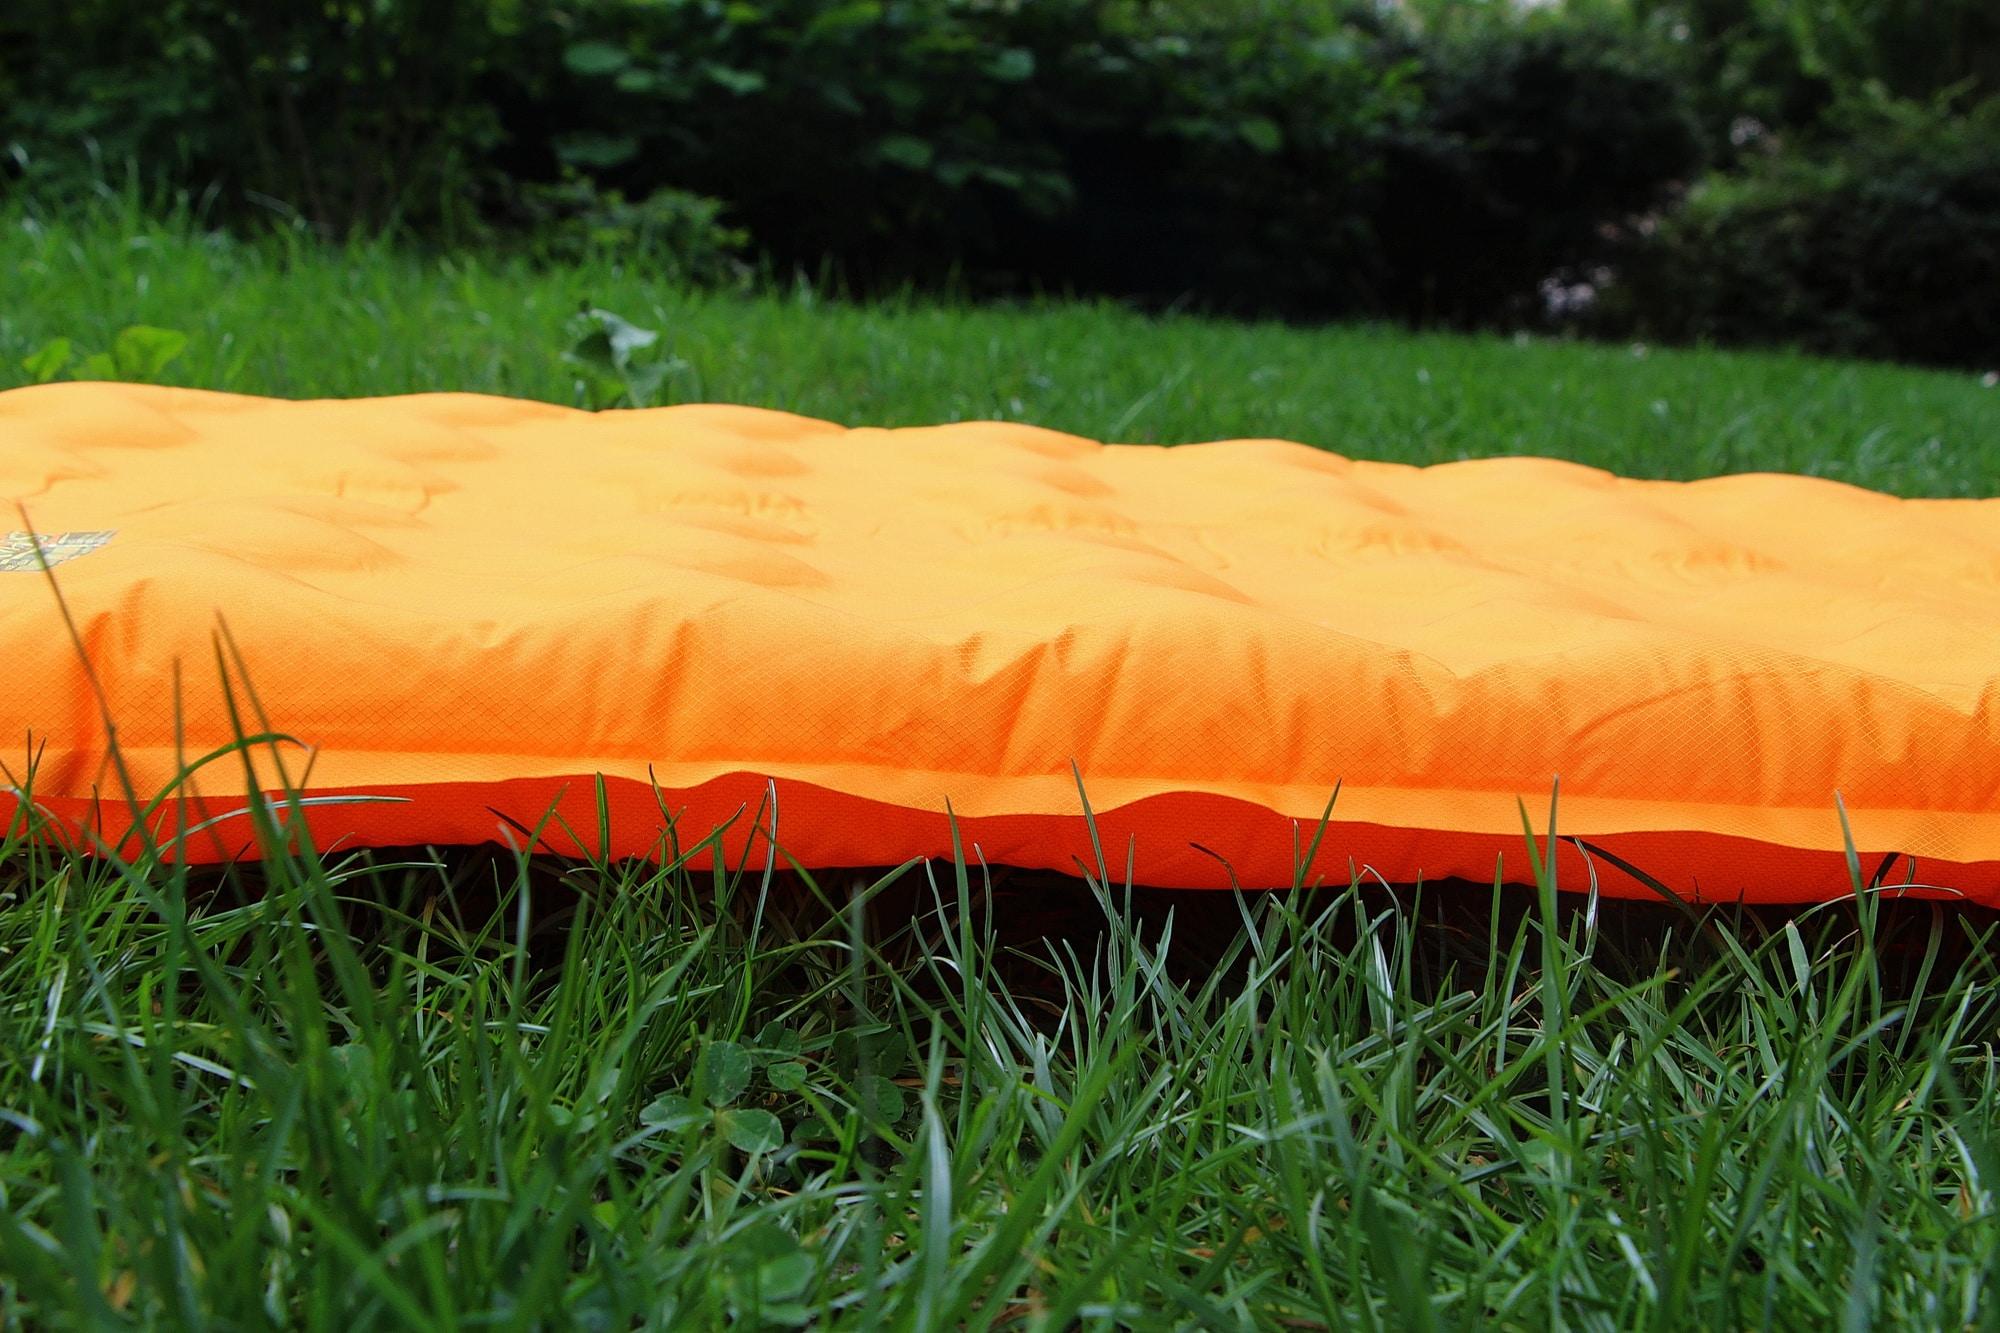 Globe trekkeuse matelas de camping thermarest evolite regular test - Dessus de matelas confort ...